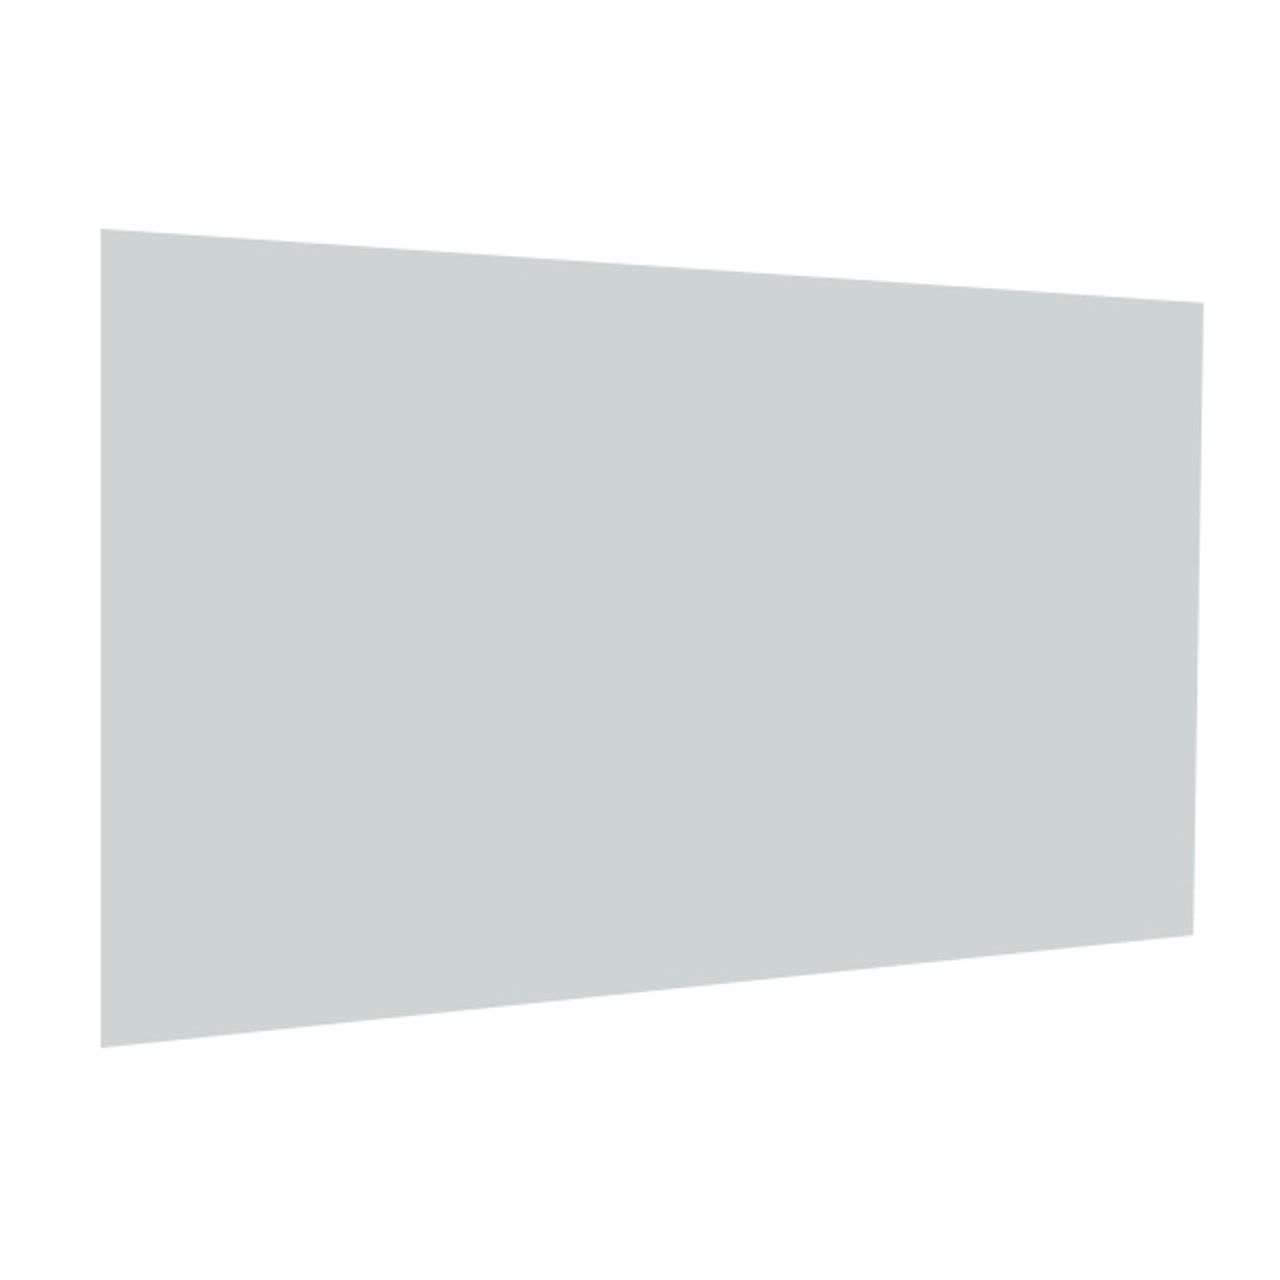 "Showcard - Dark Grey/Light Grey - 30"" x 40"""